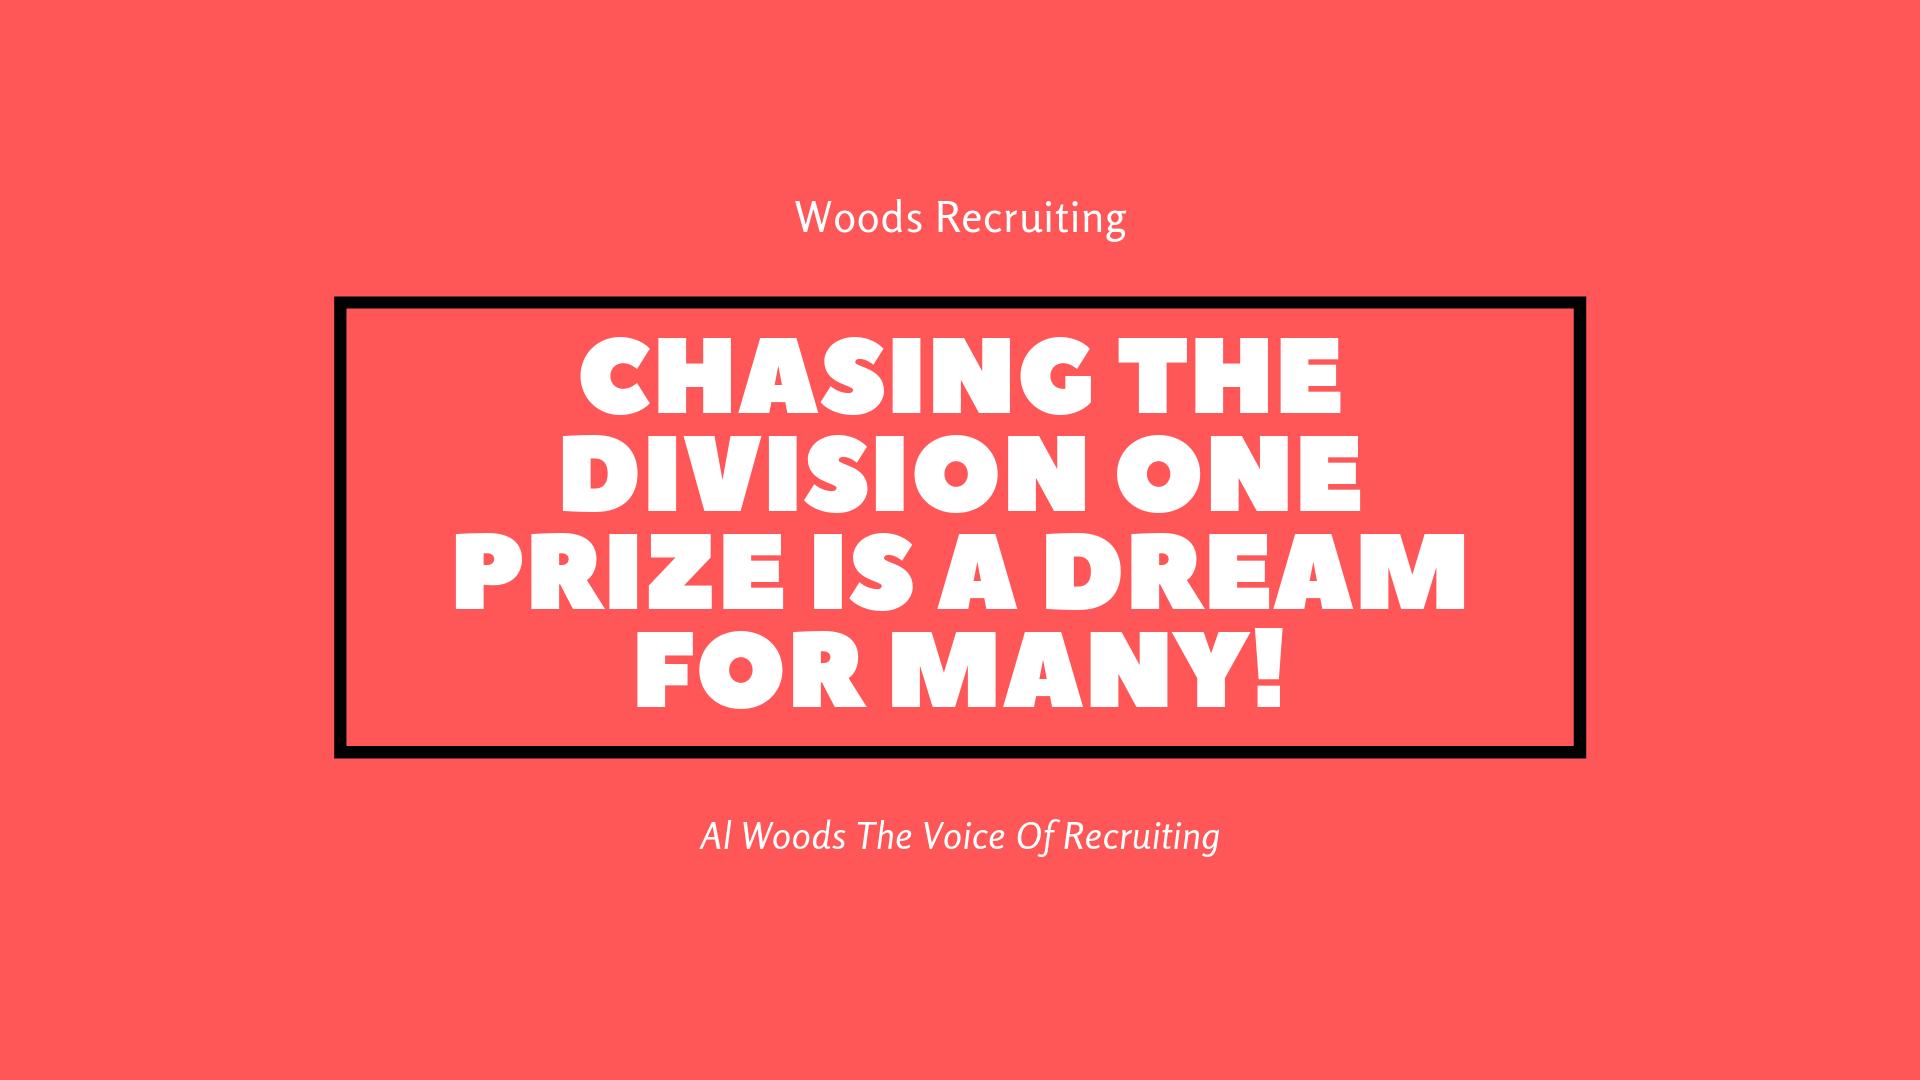 Don't Throw Away Recruiting Opportunities! - Woods Recruiting